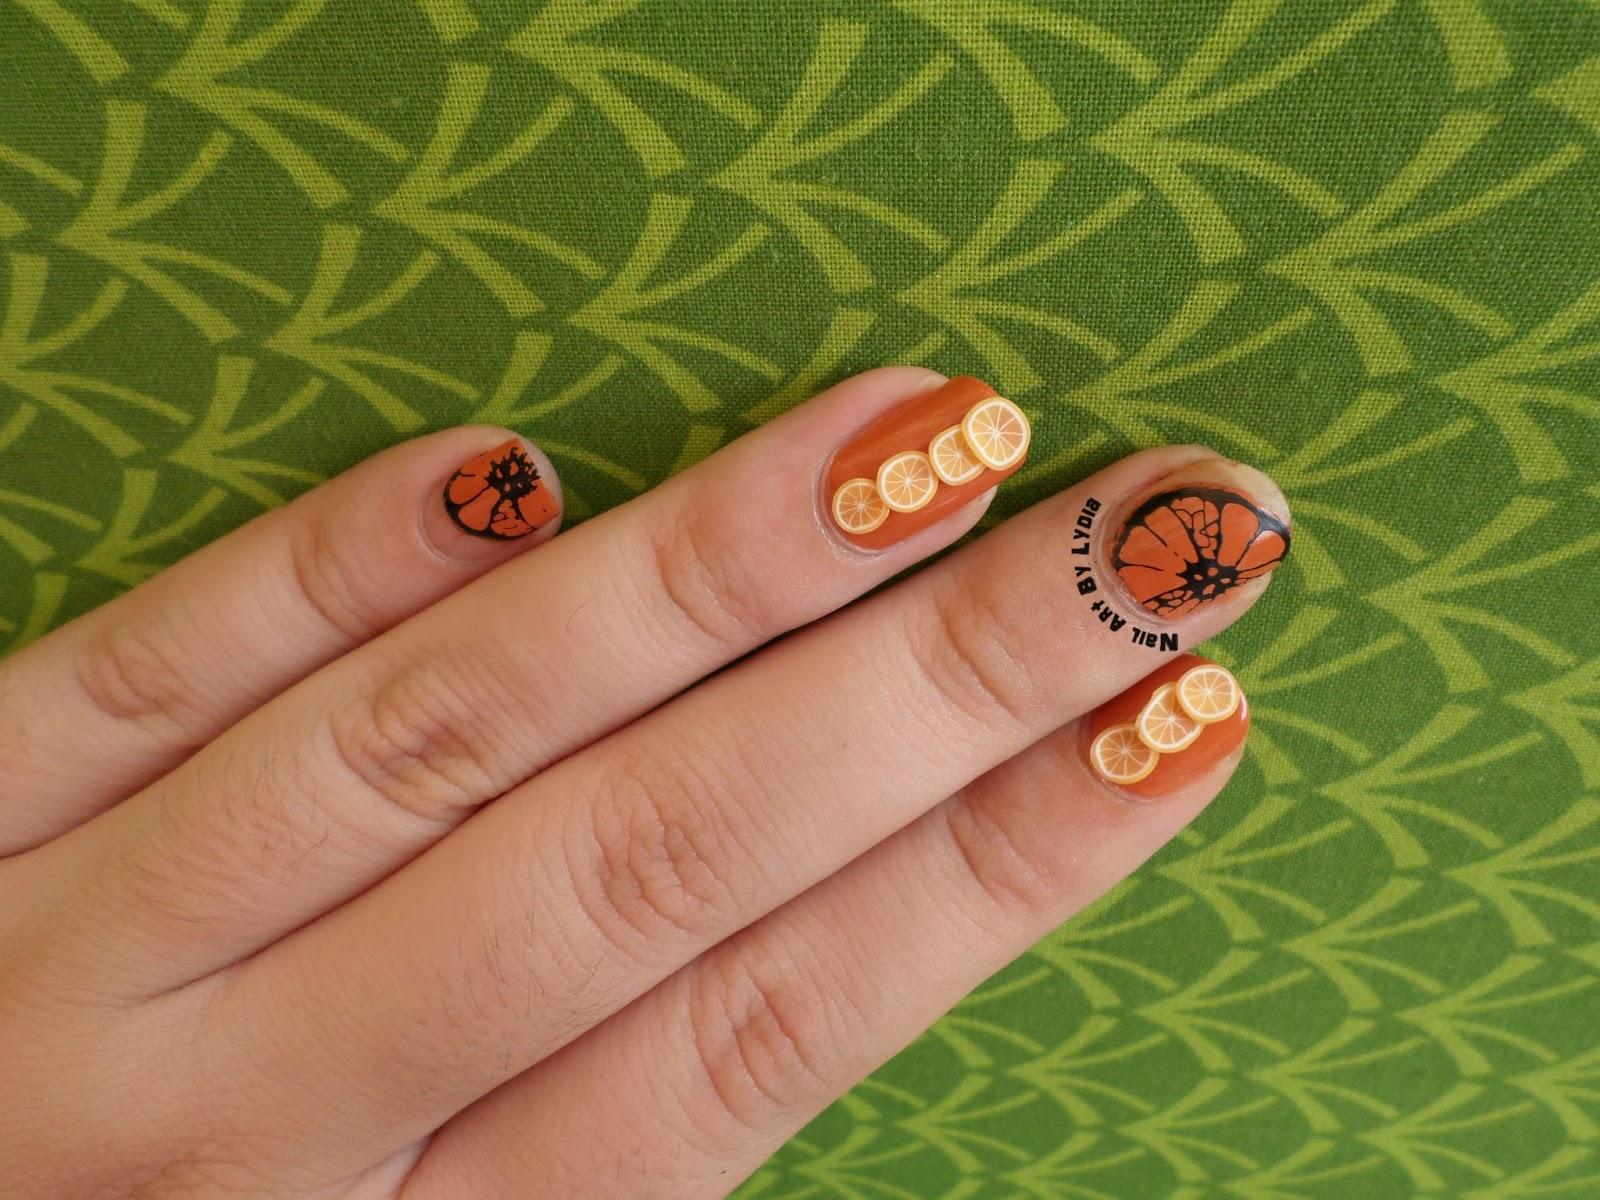 Asombroso Mate Uñas Naranja Cresta - Ideas de Pintar de Uñas ...